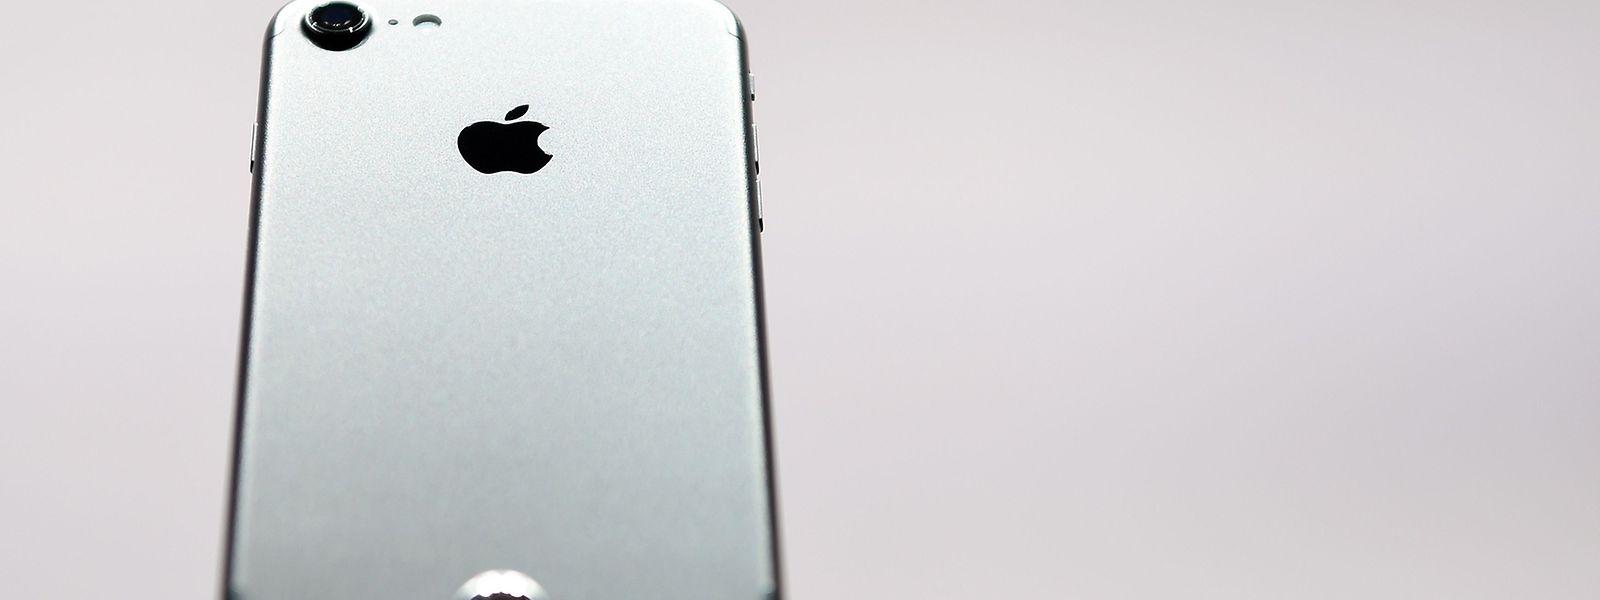 Apple wächst wieder - iPhone 7 sei Dank.